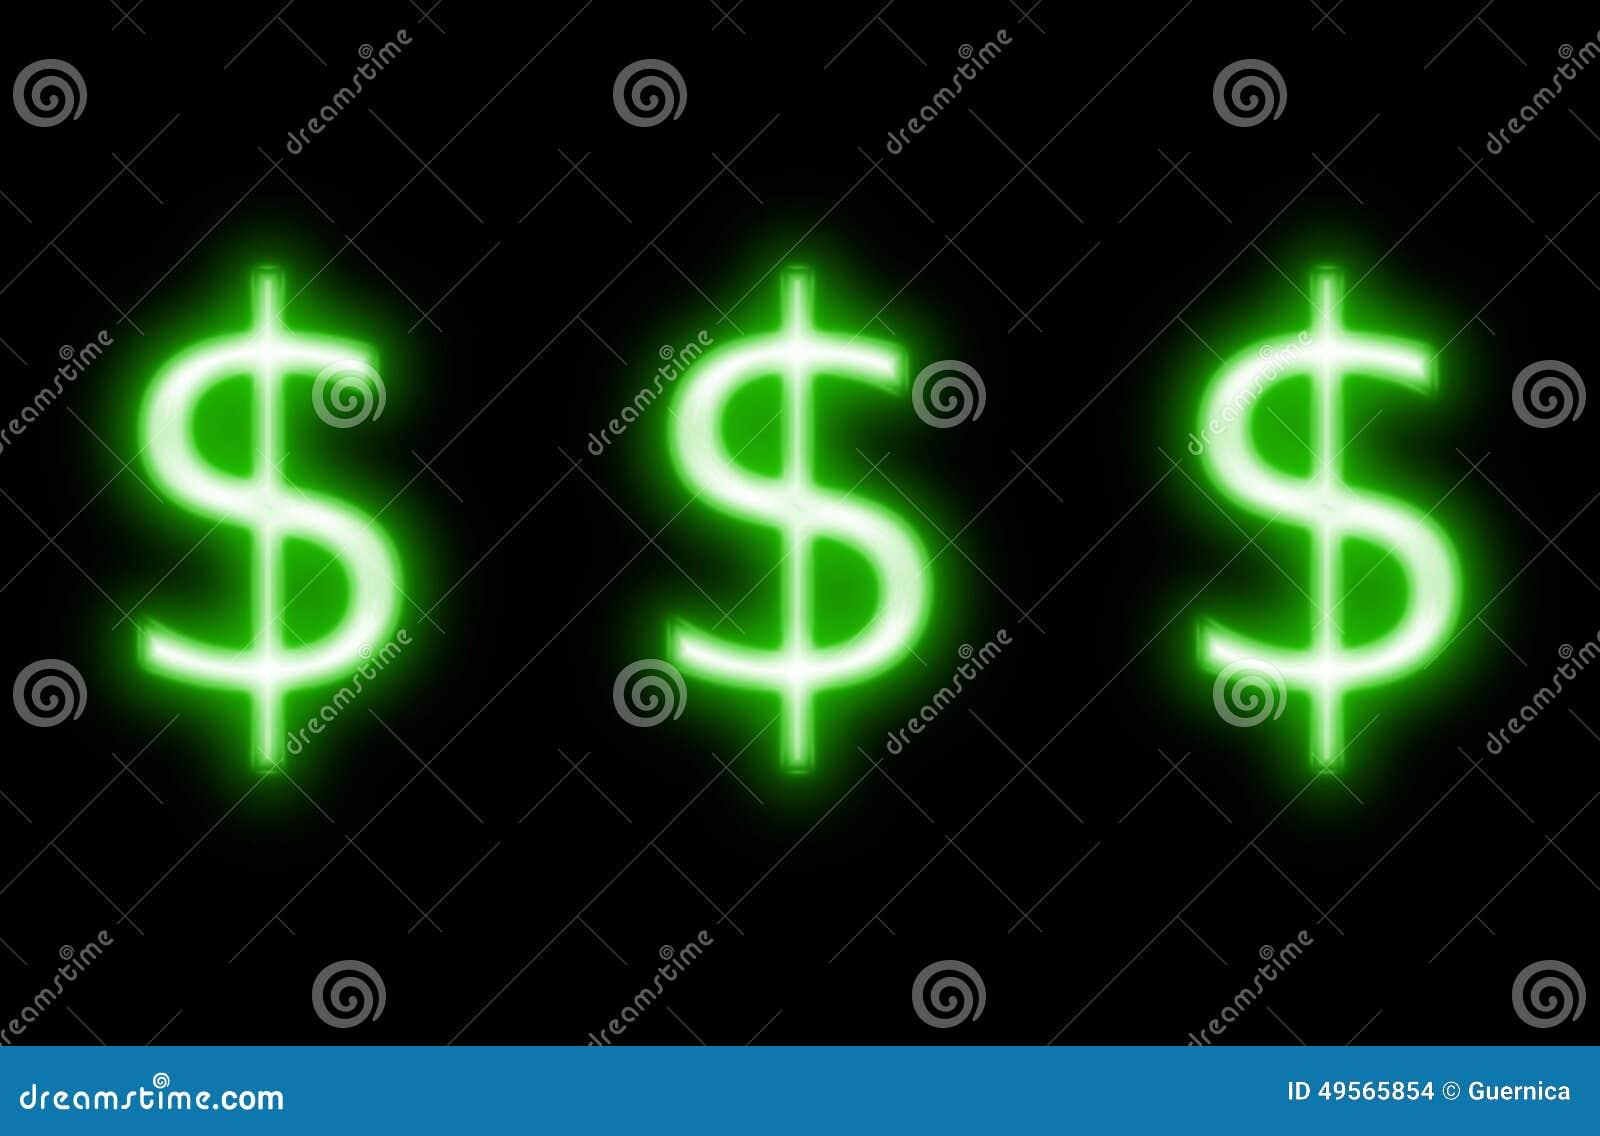 $ dollar sign neon